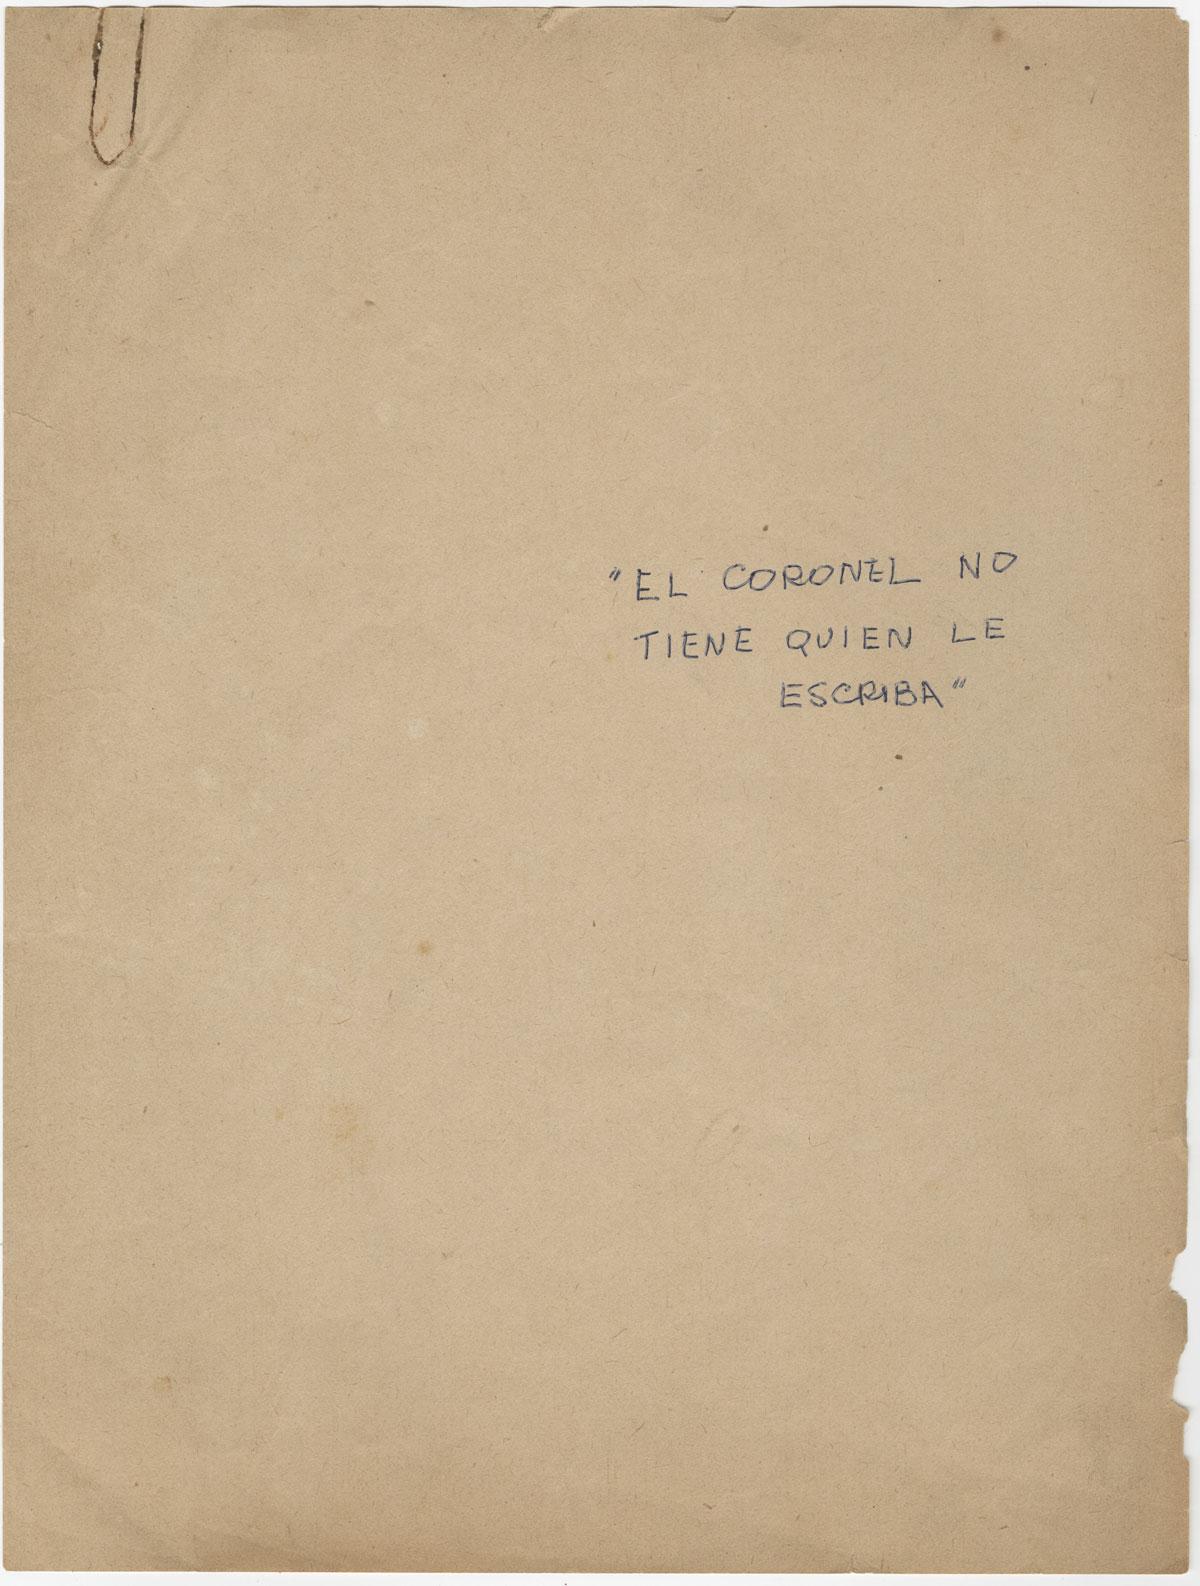 The cover of the carbon typescript of El coronel no tiene quien le escriba [No One Writes to the Colonel], 1957.